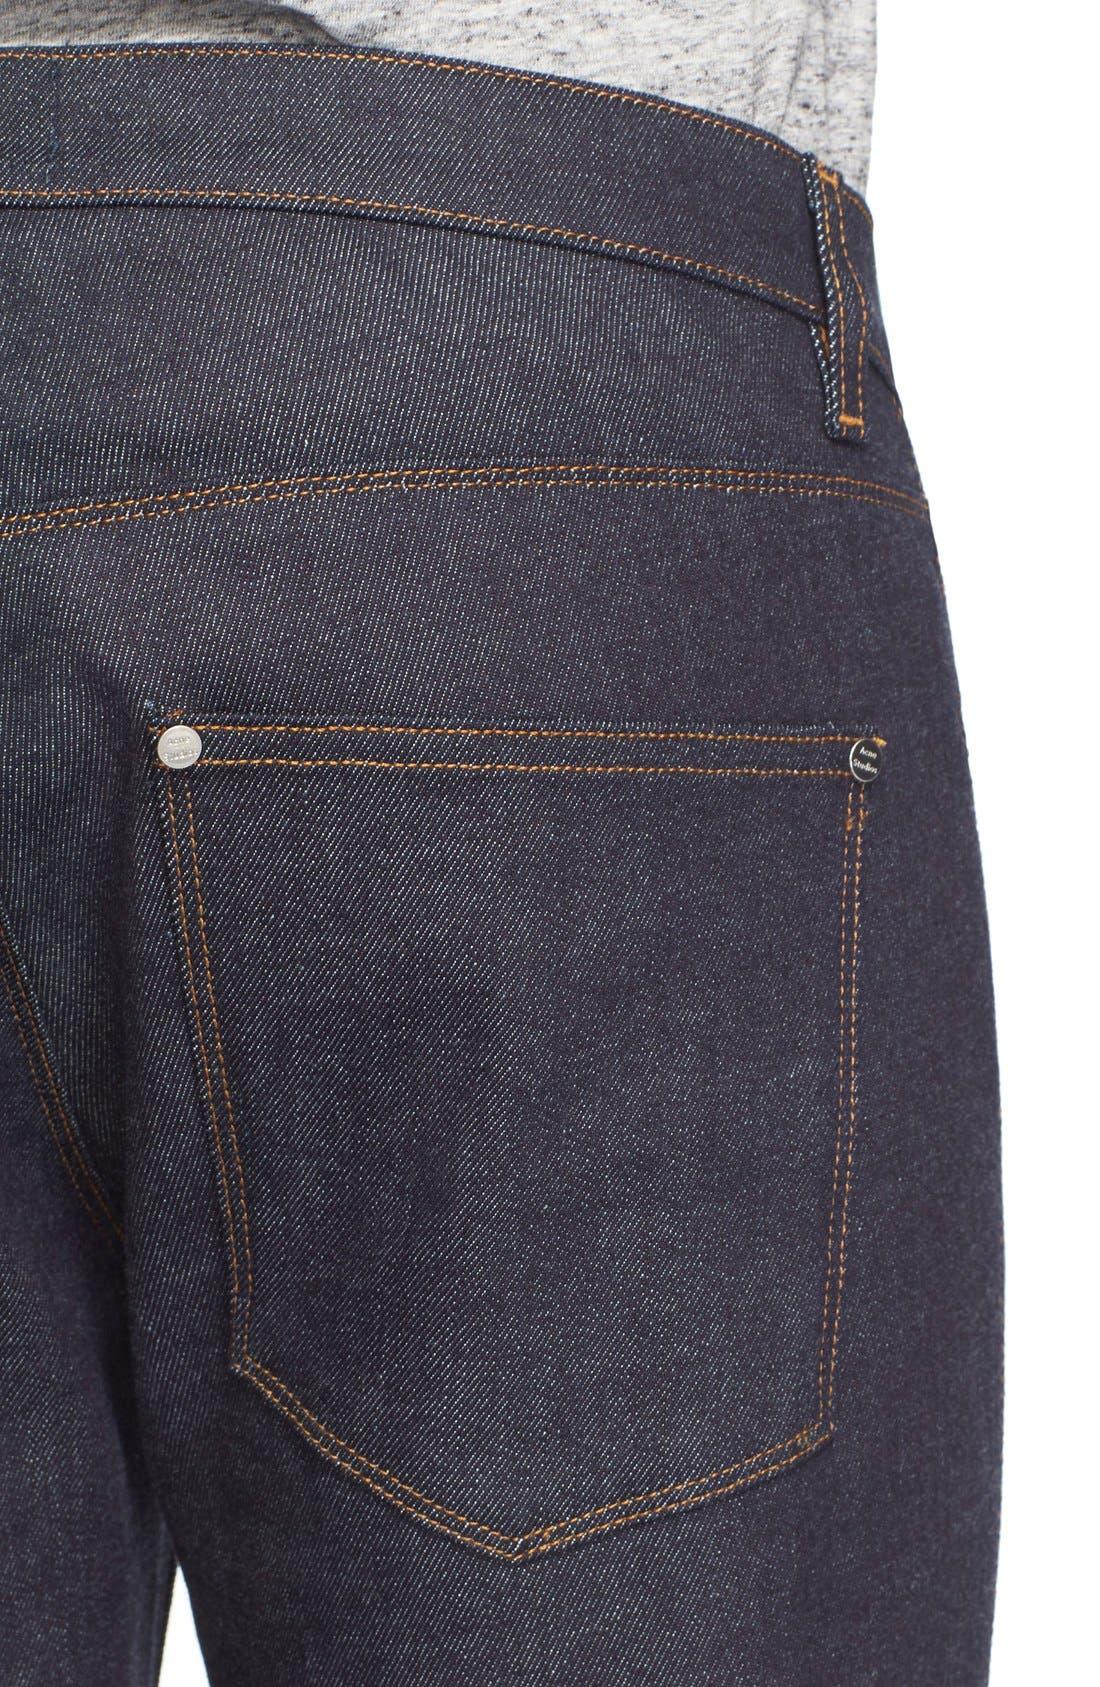 Max Slim Straight Leg Jeans,                             Alternate thumbnail 4, color,